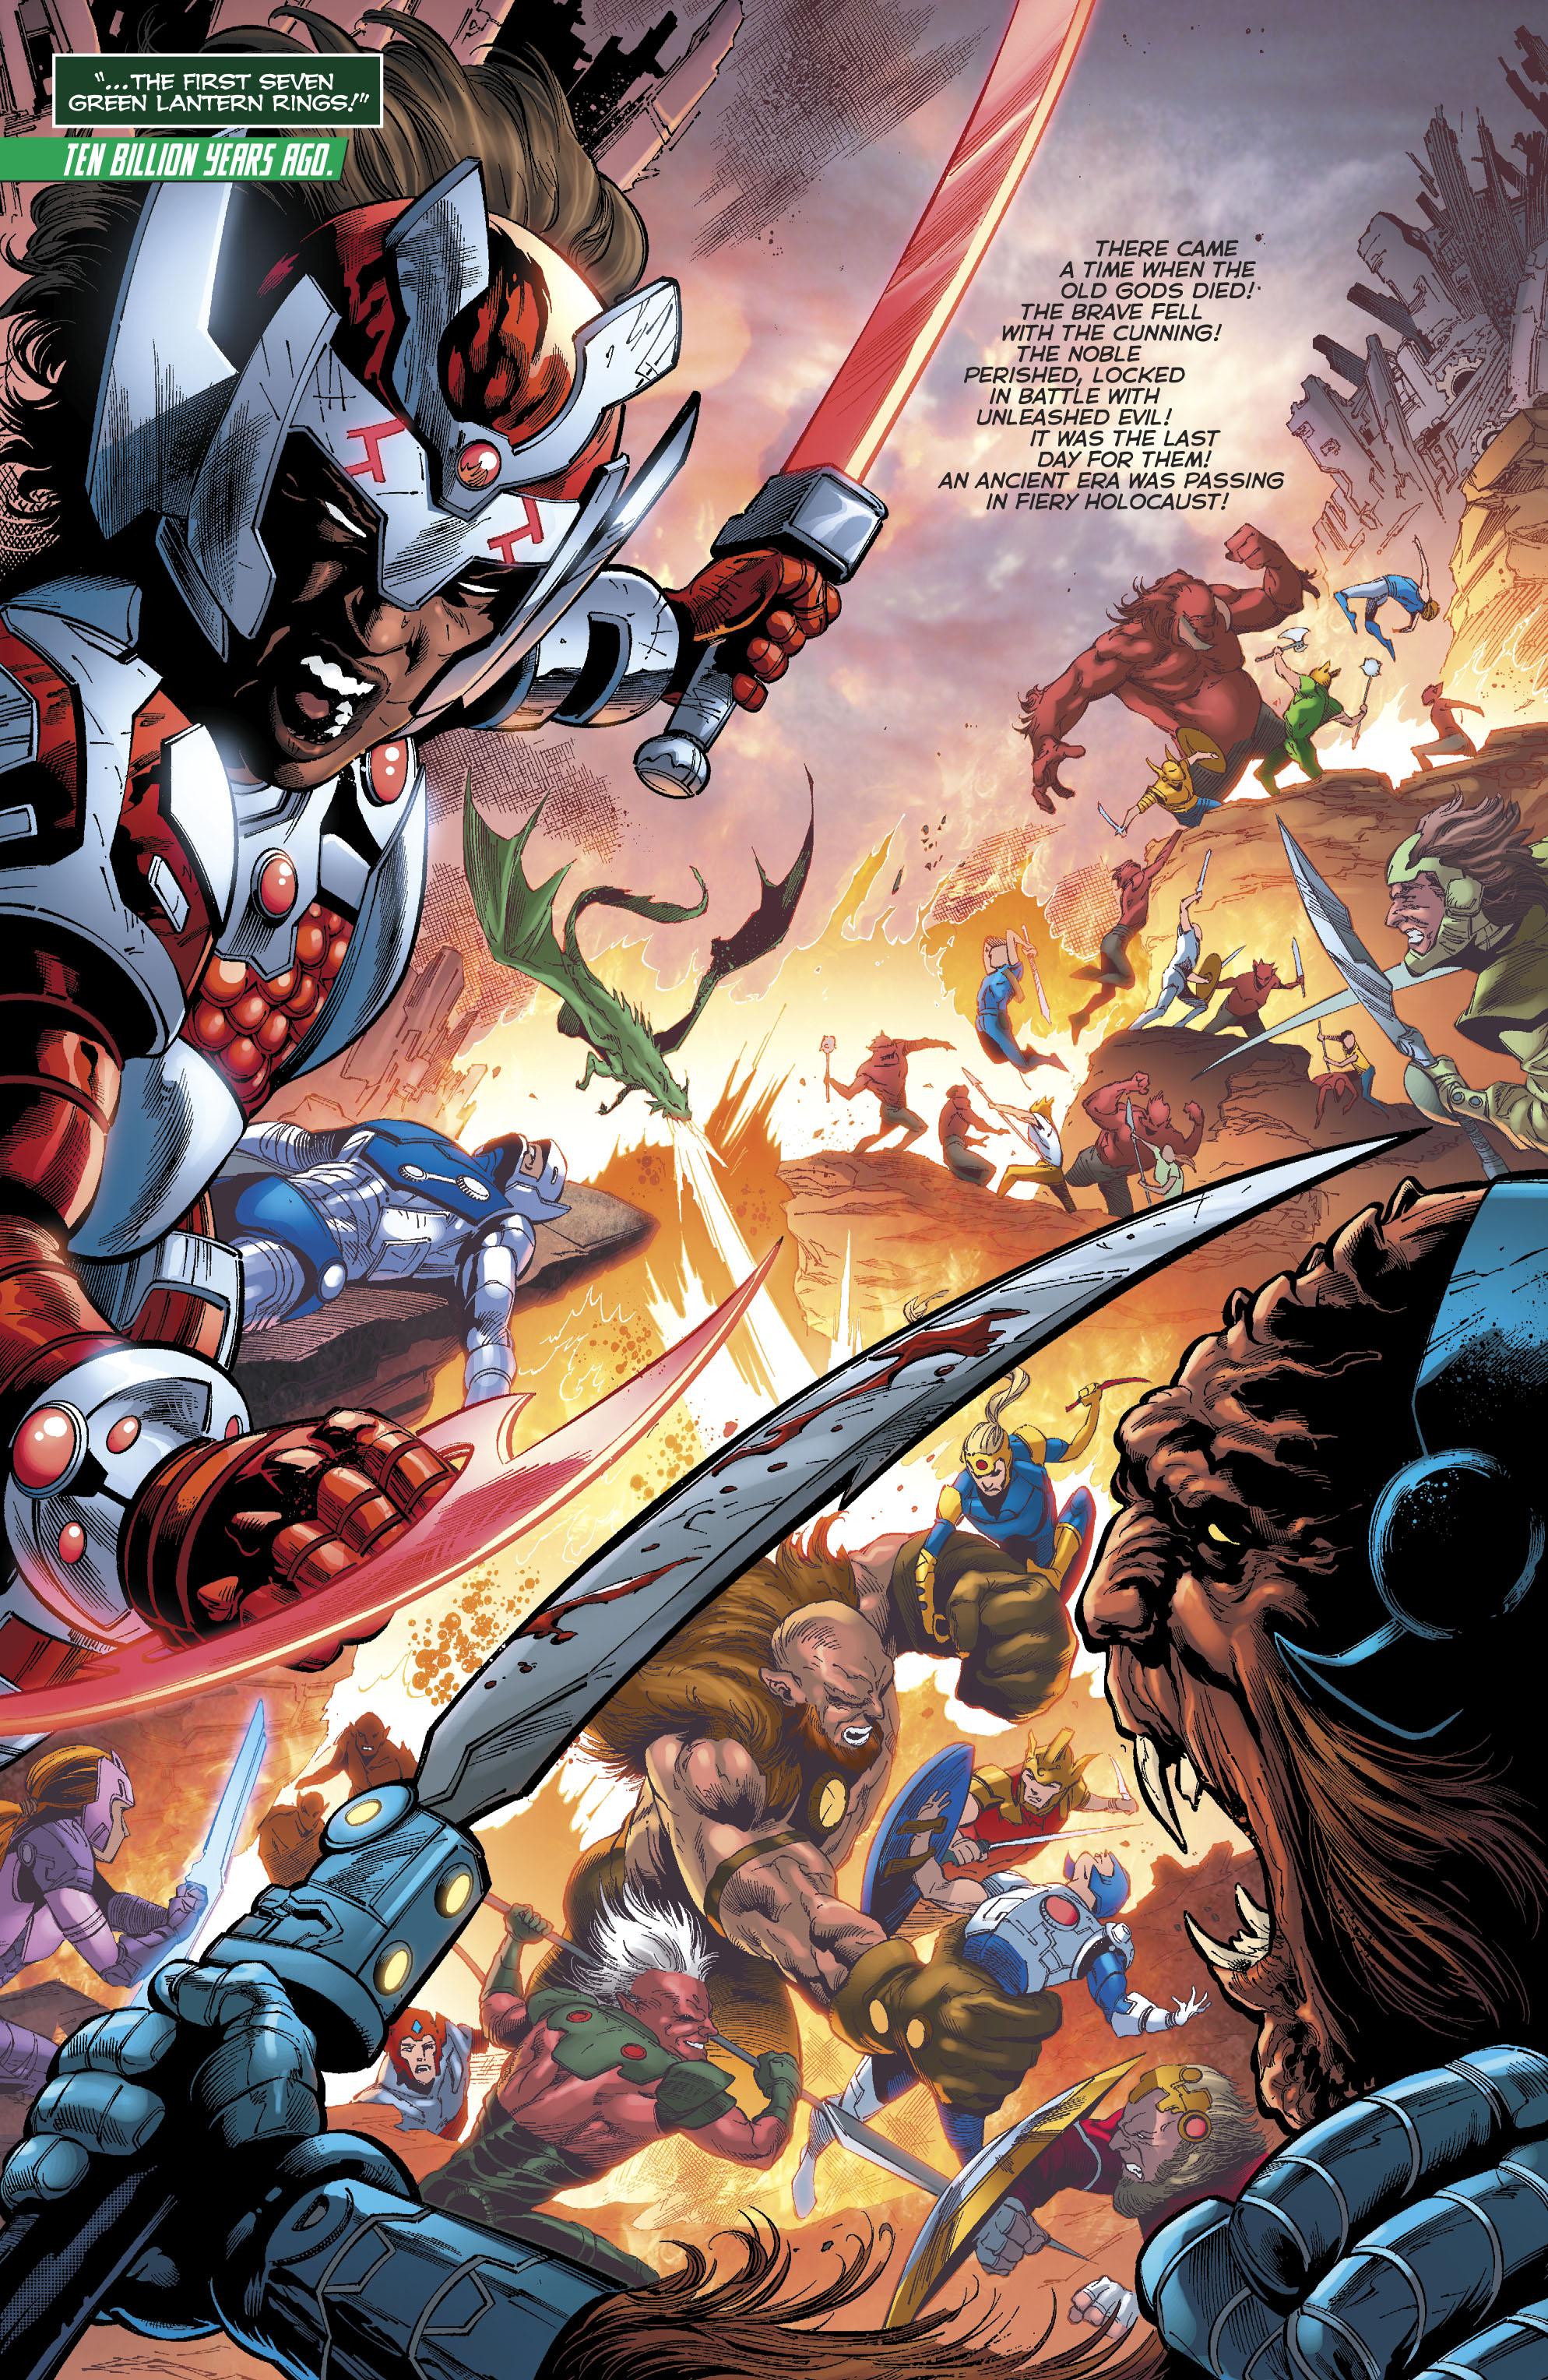 Read online Green Lanterns comic -  Issue #23 - 11